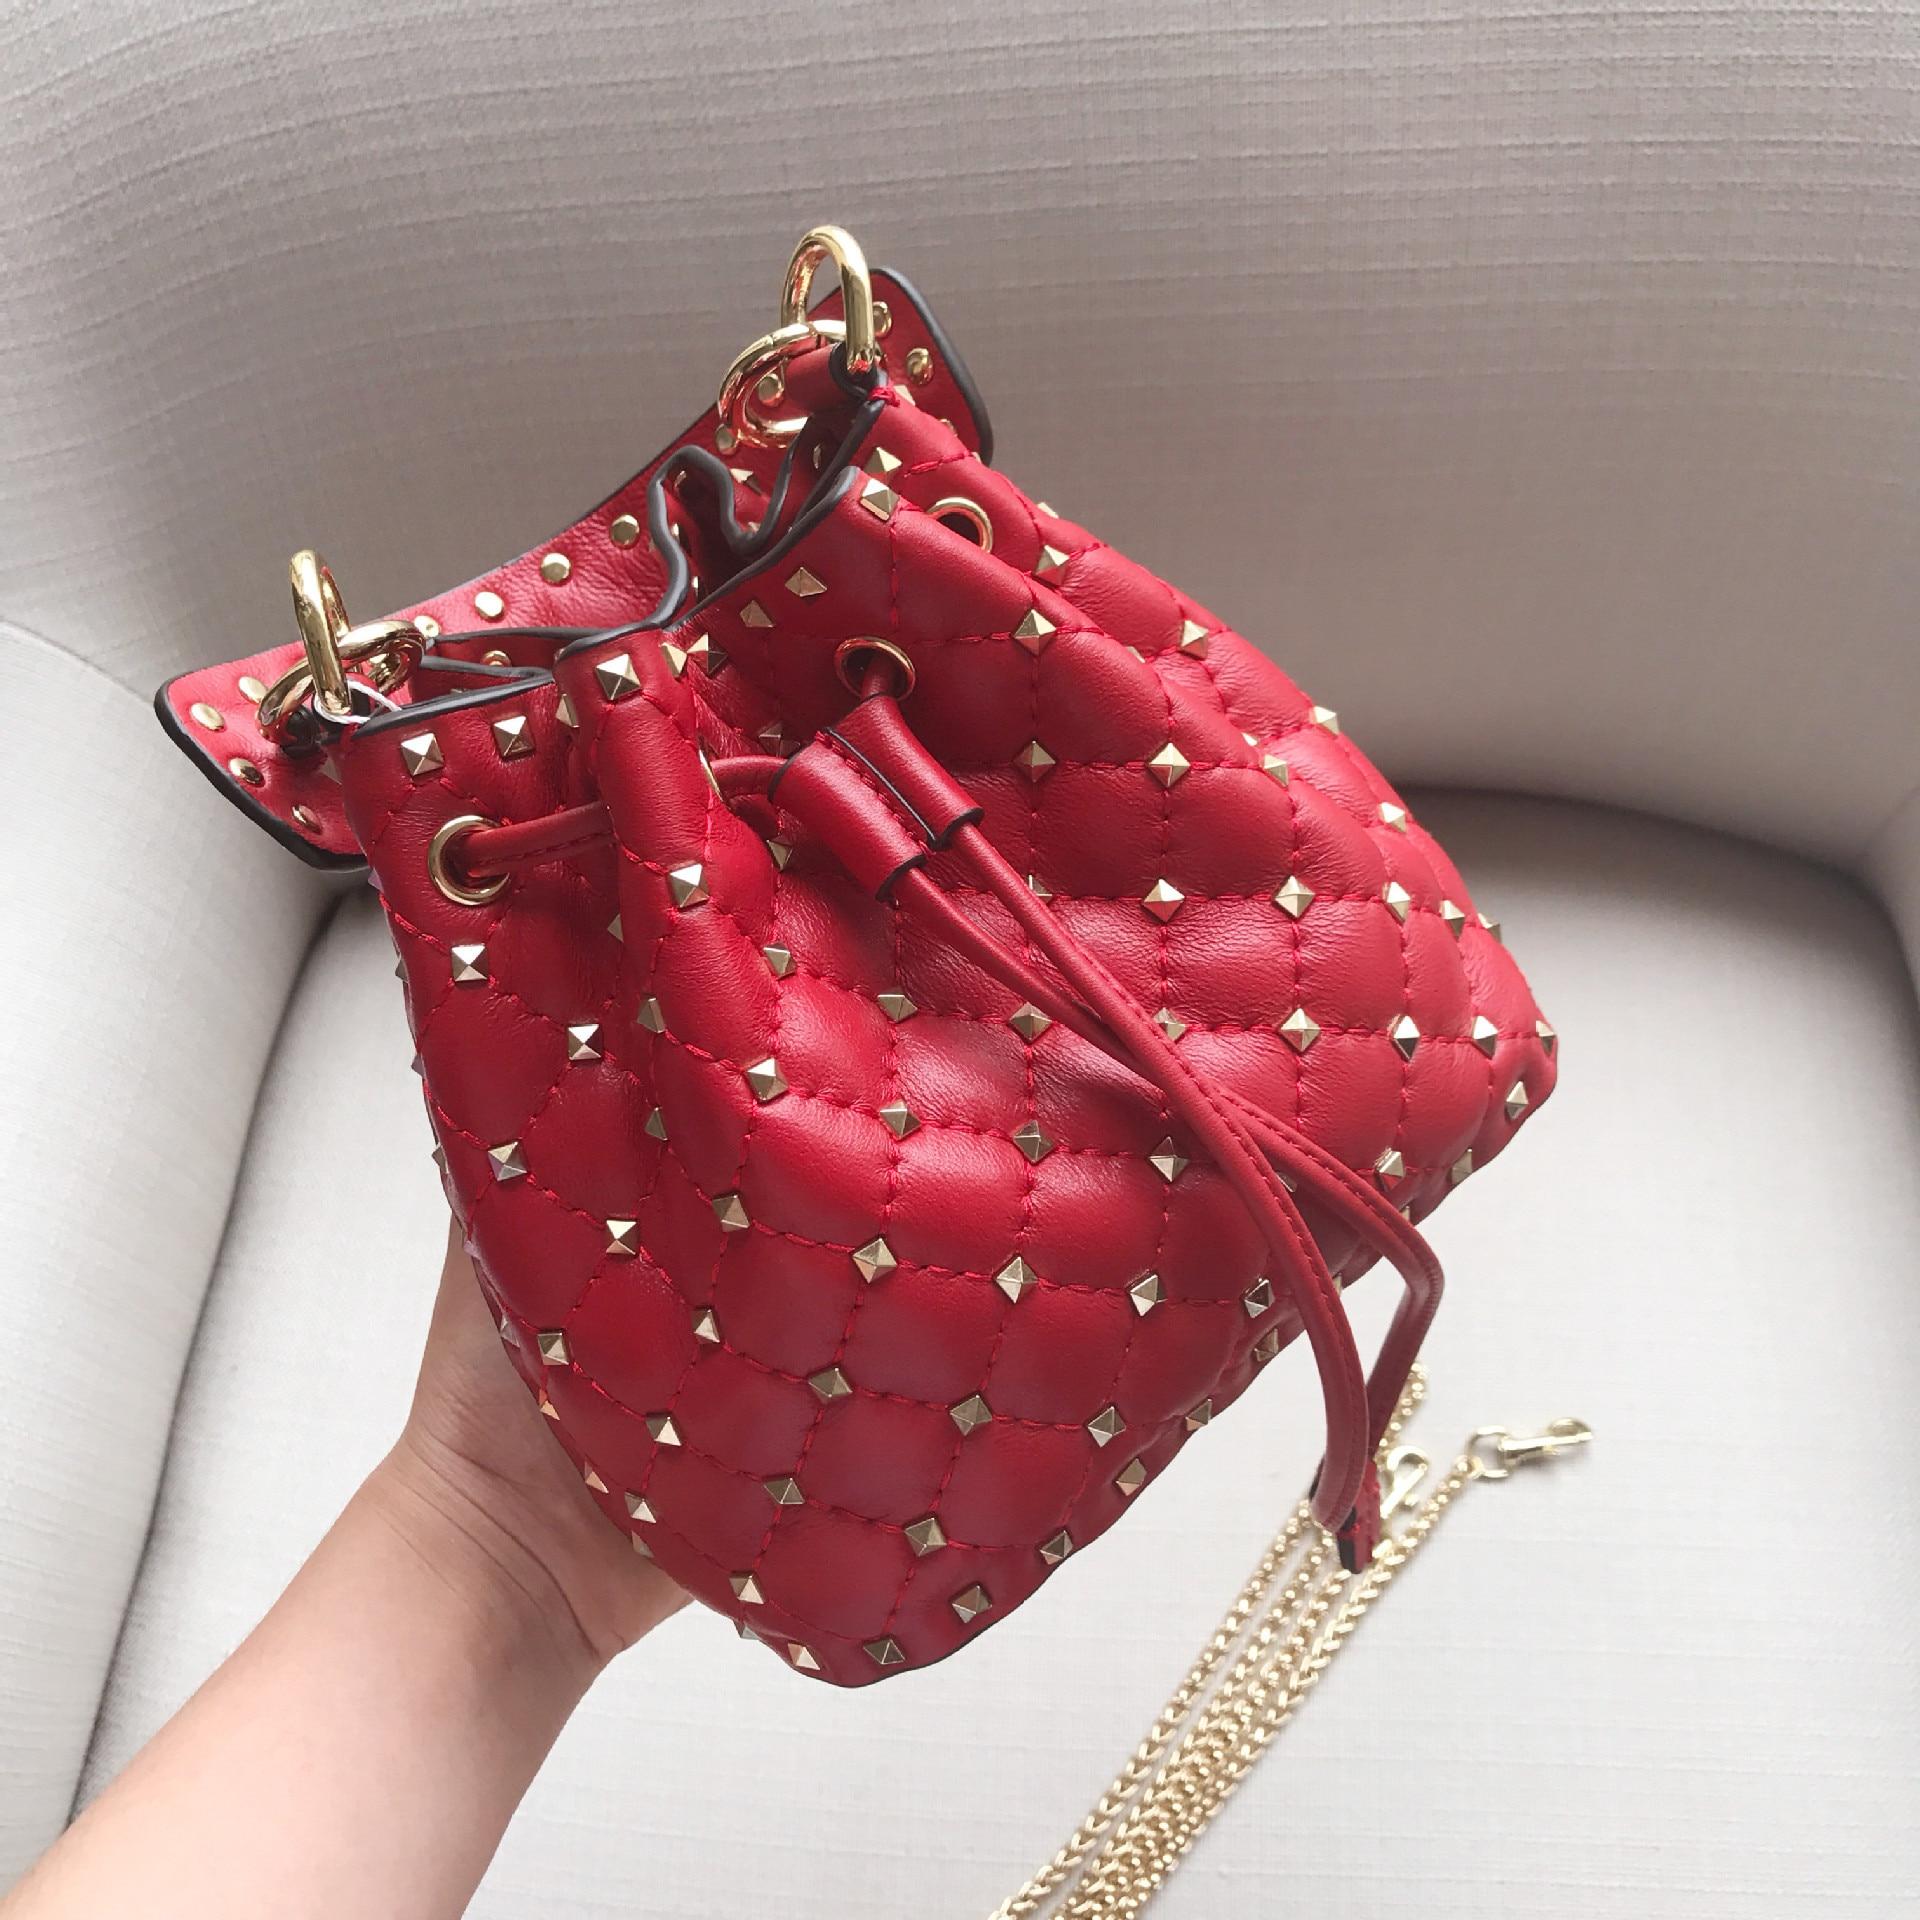 2019 NEW Custom Clutch Women BUCKET Real Leather Cowhide Brand Handbags  Ring High-end Small ba10d738973ea